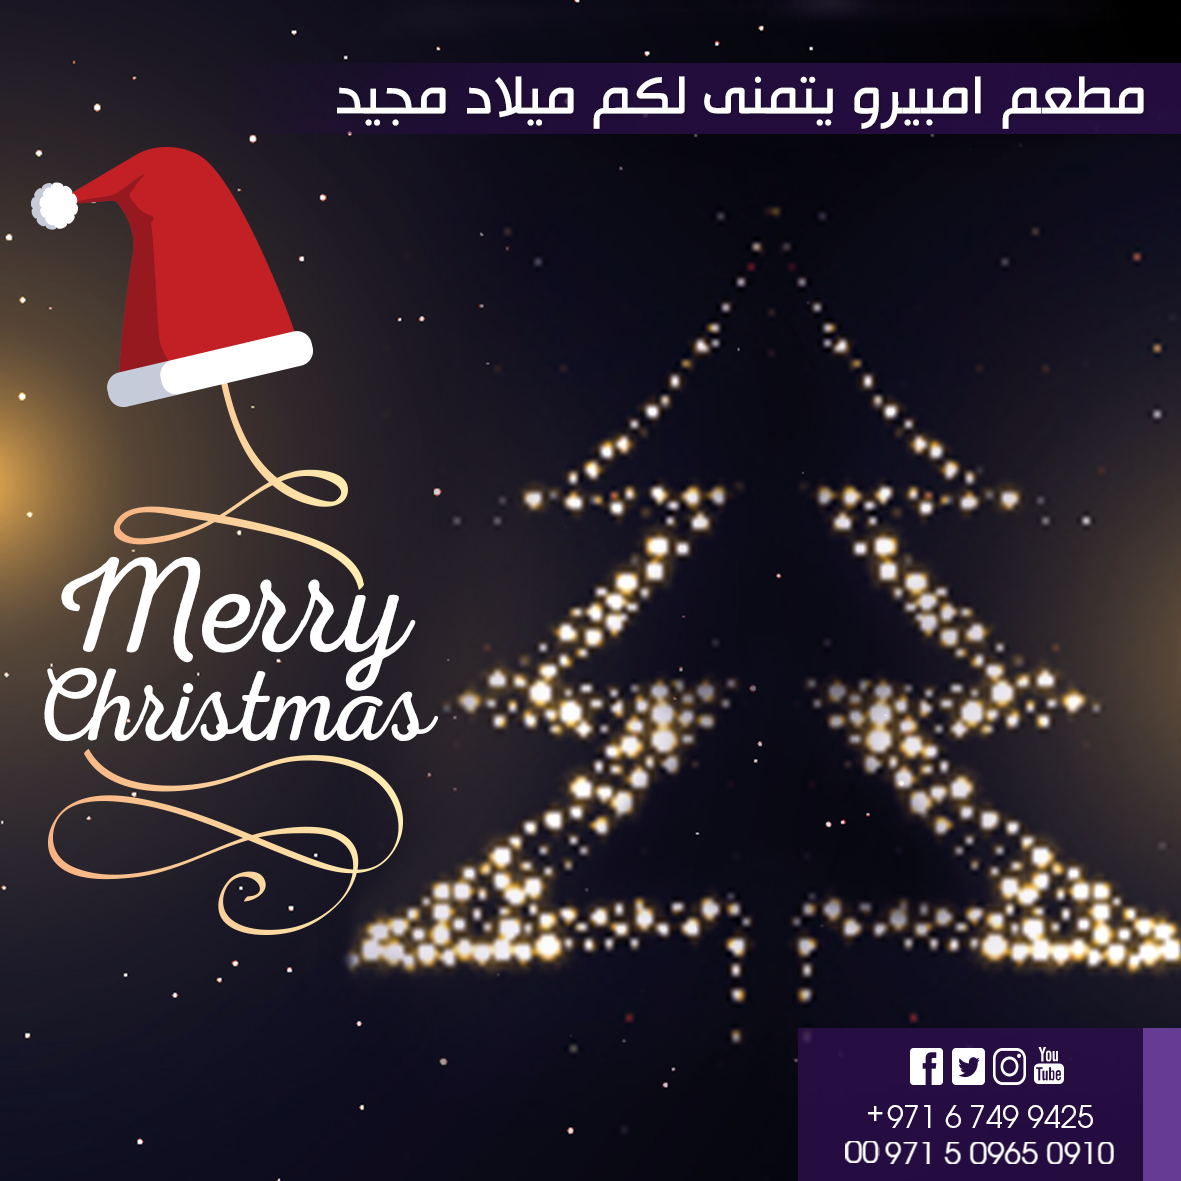 Merry Christmas مطعم امبيرو يتمنى لكم ميلاد مجيد Eat Wish Imperorestaurant Merry Christmas Merry Poster